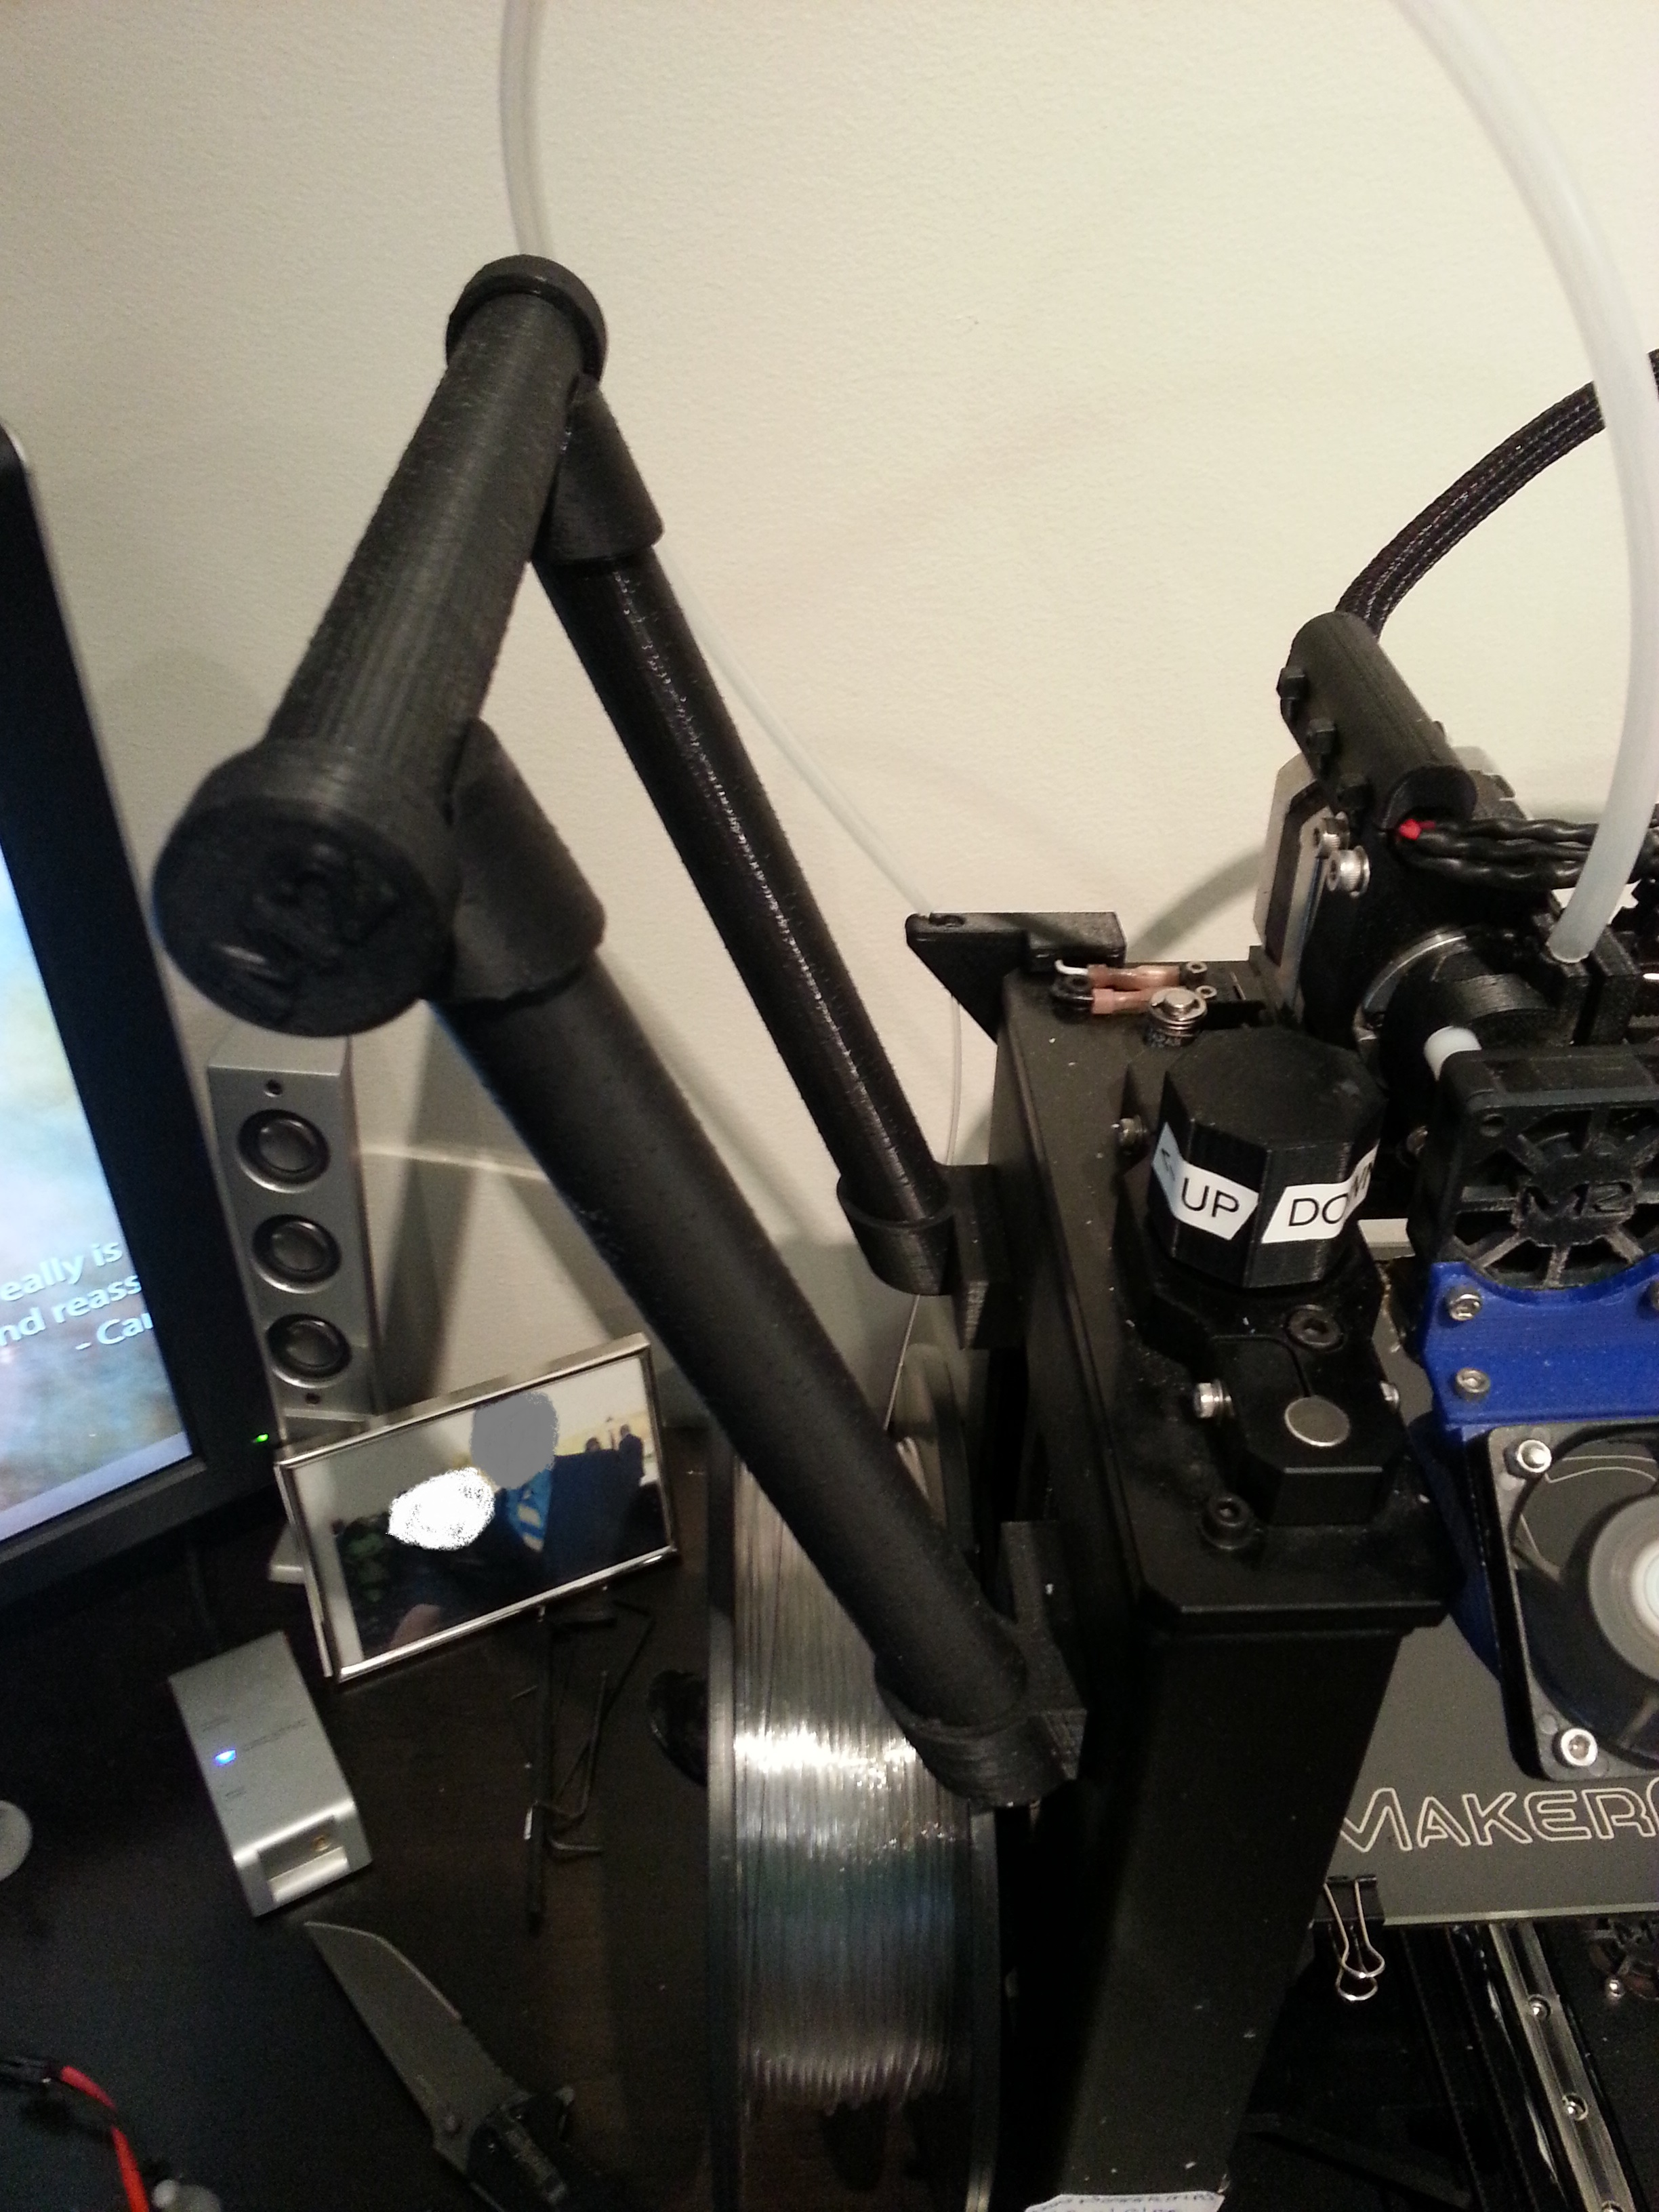 MakerGear M2 Printer Spool Holder   MakerGear M2 - 0.2mm layers - Black PLA